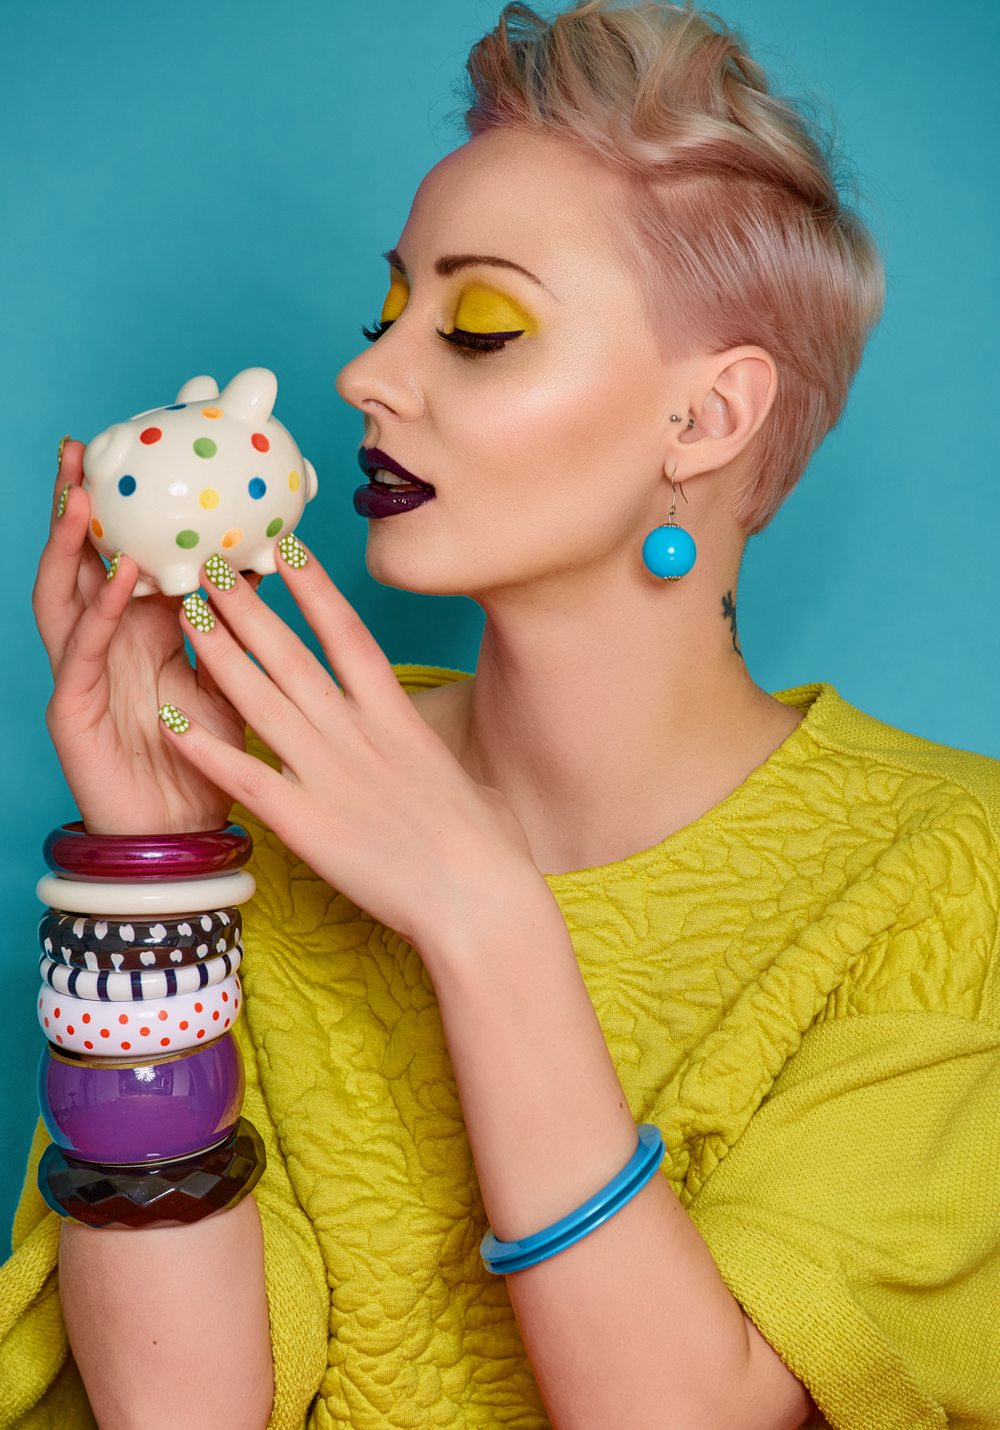 K14_0673-184-Kamal Mostofi-Beauty_ZyZi Makeup_Sally_80s.jpg